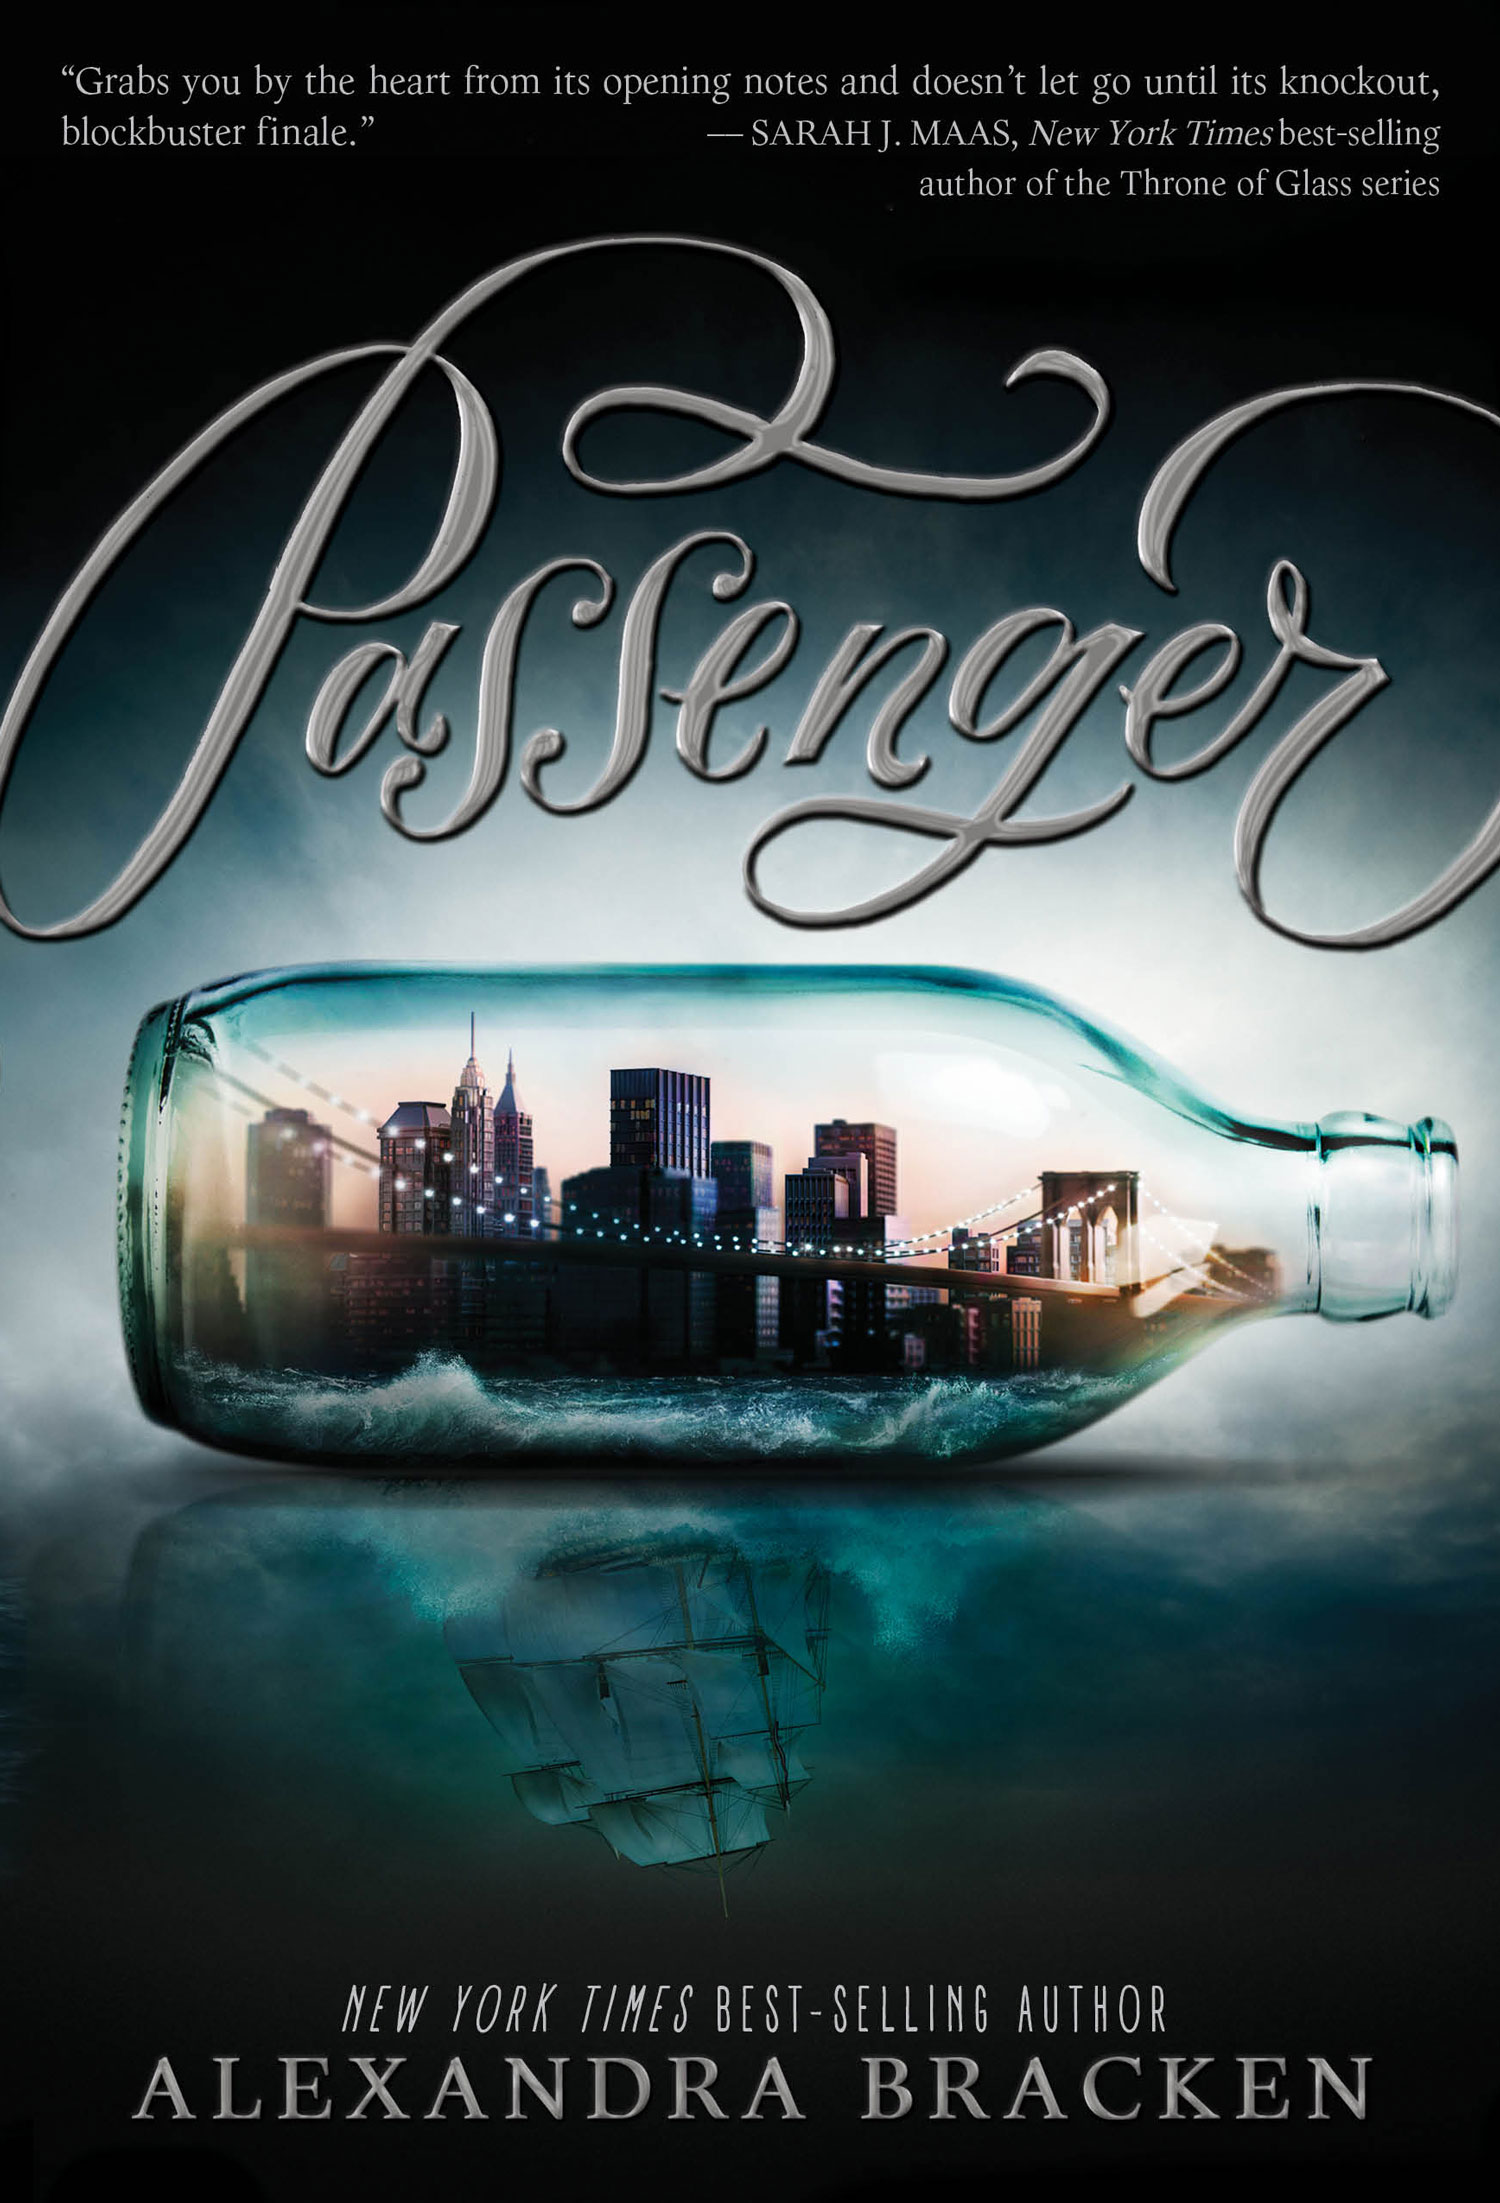 Passenger by Alexandra Bracken - Giveaway on Clear Eyes, Full Shelves